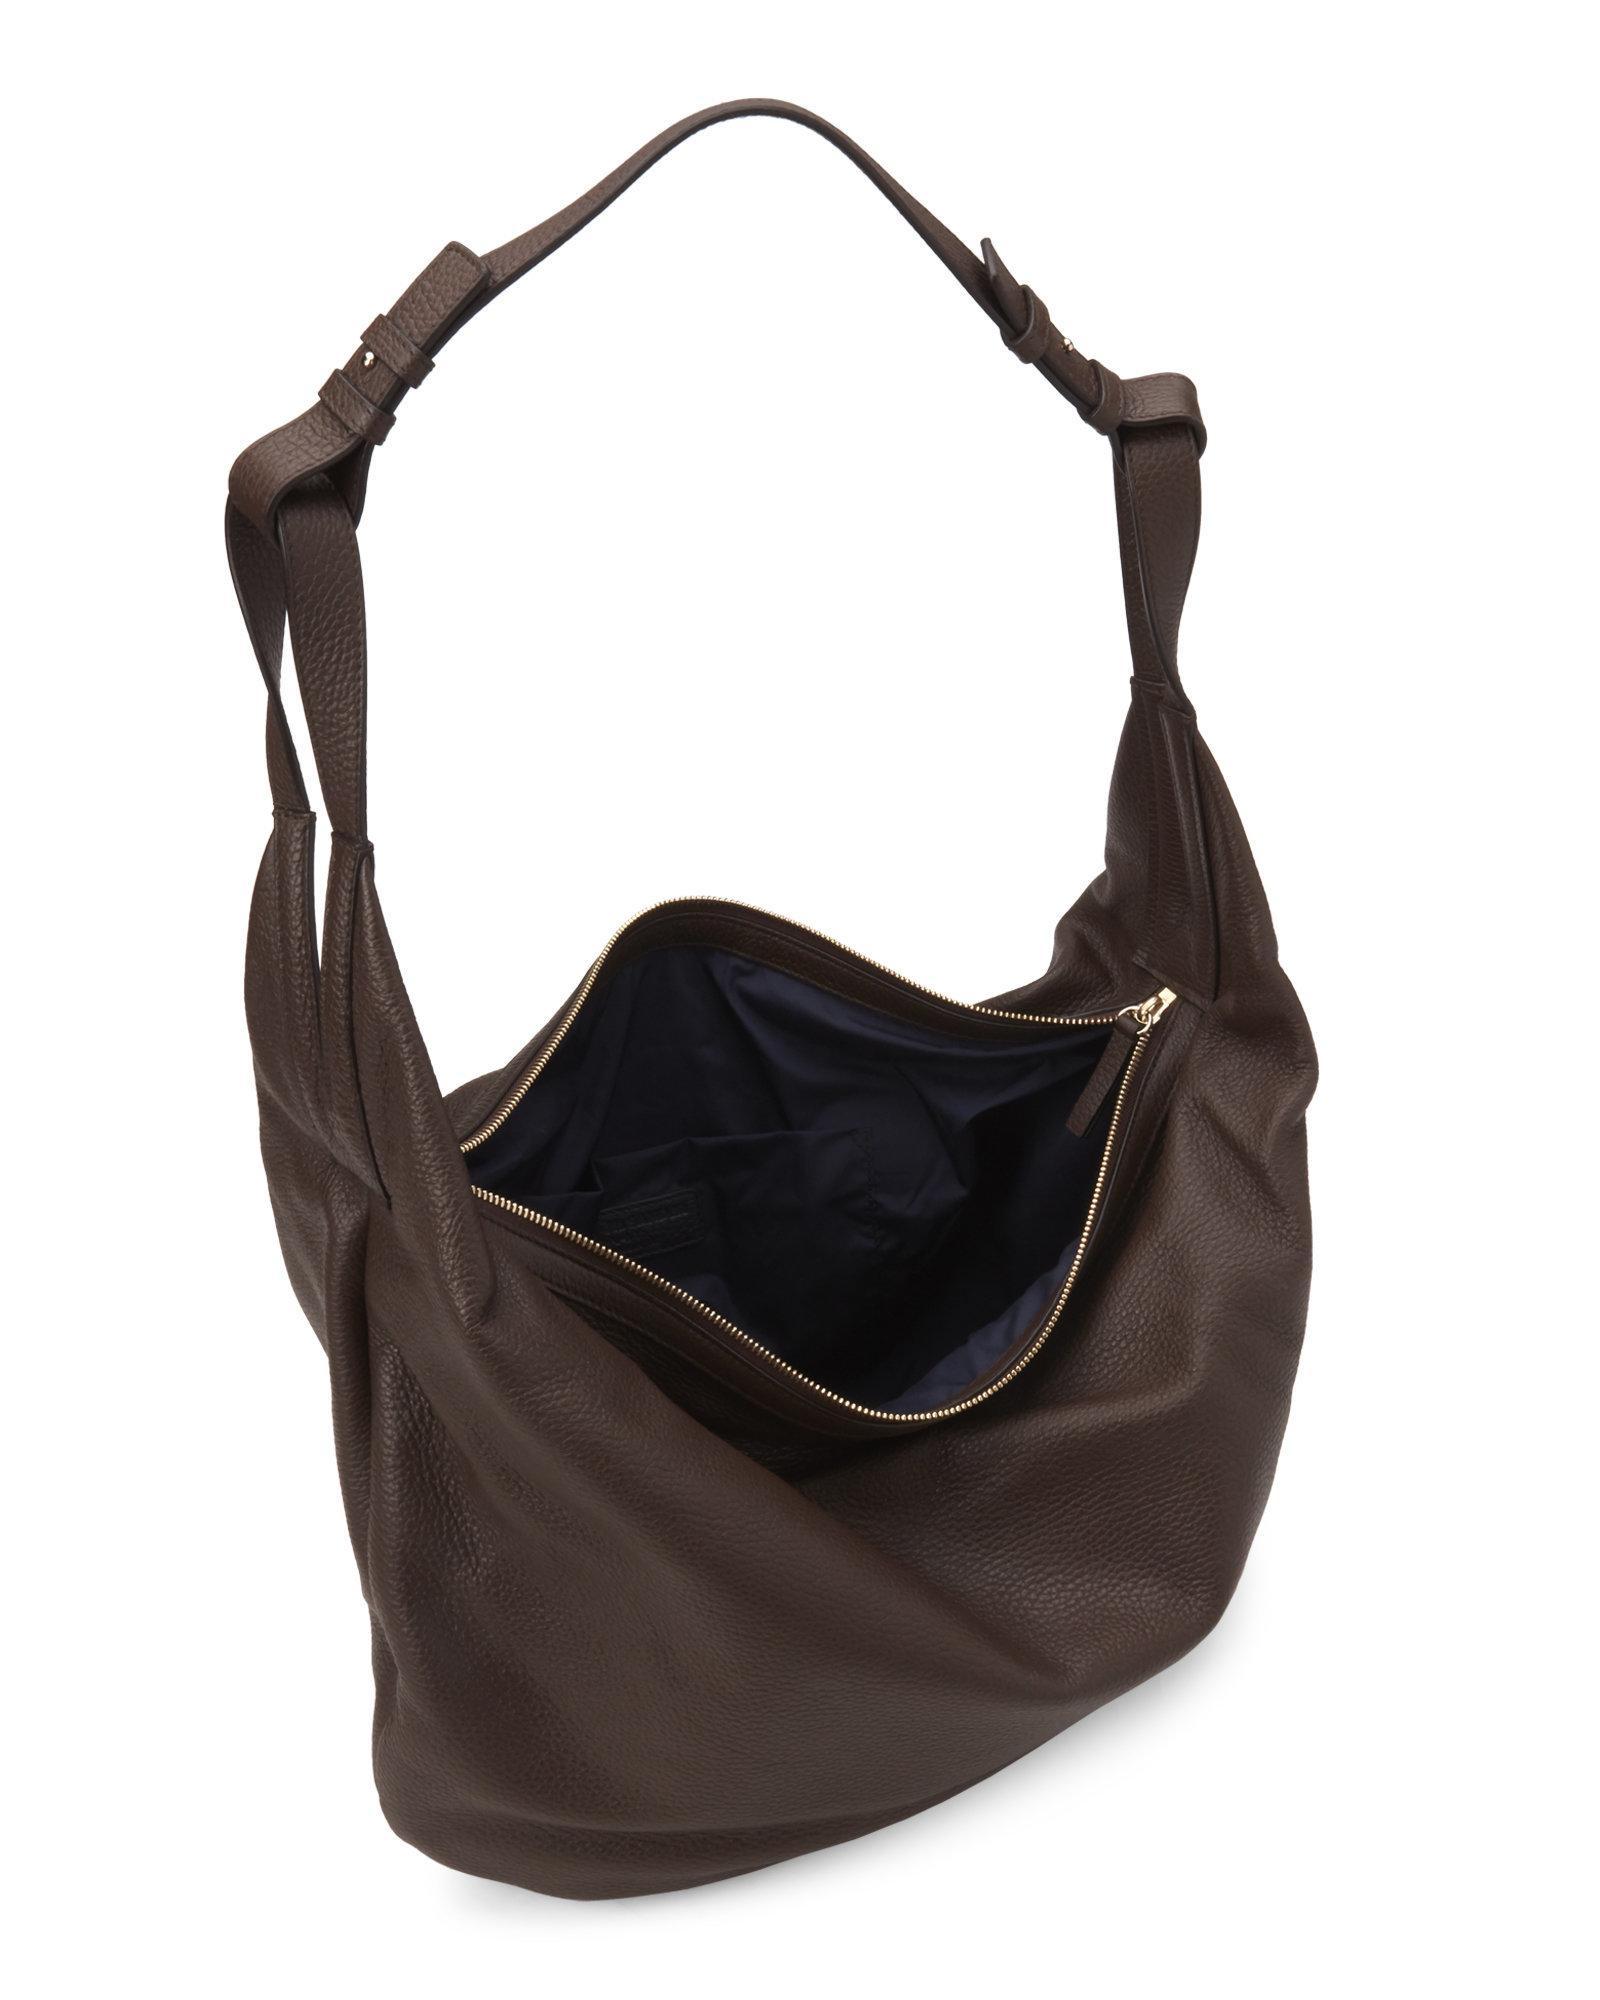 Lyst - Jil Sander Navy Brown Leather Shoulder Bag in Brown db0303c73f2c2